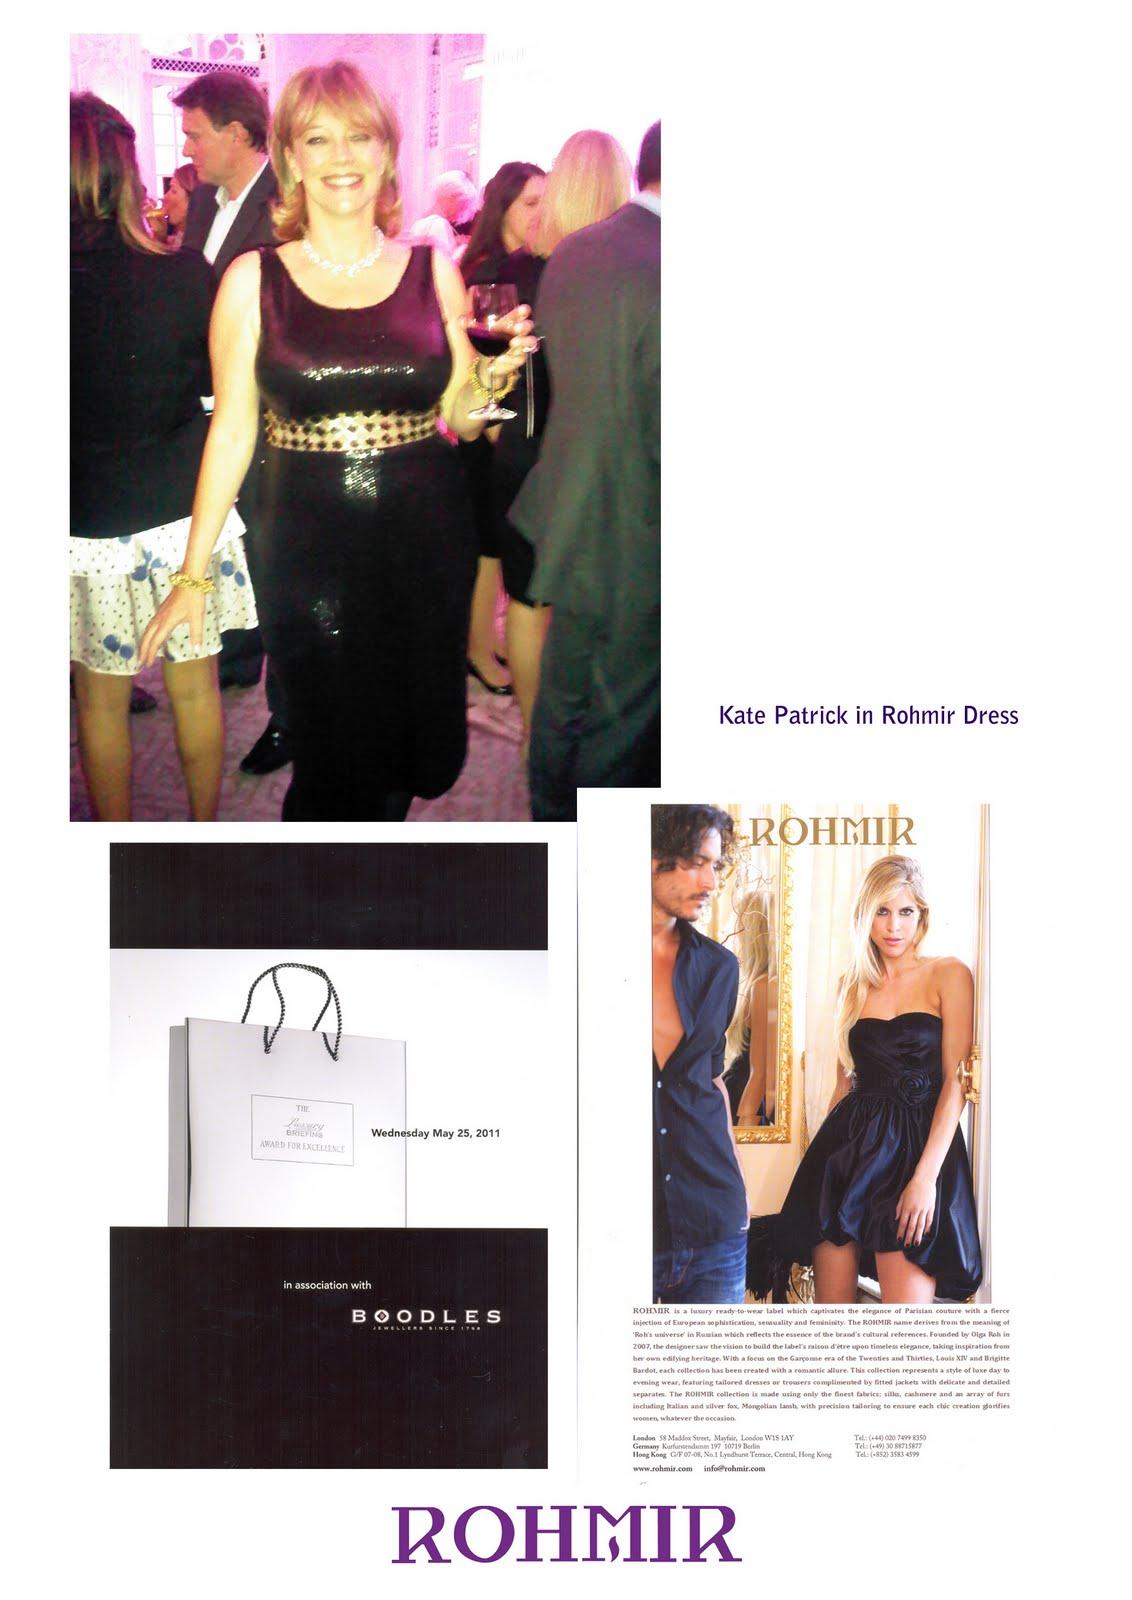 Kate Patrick in Rohmir Dress